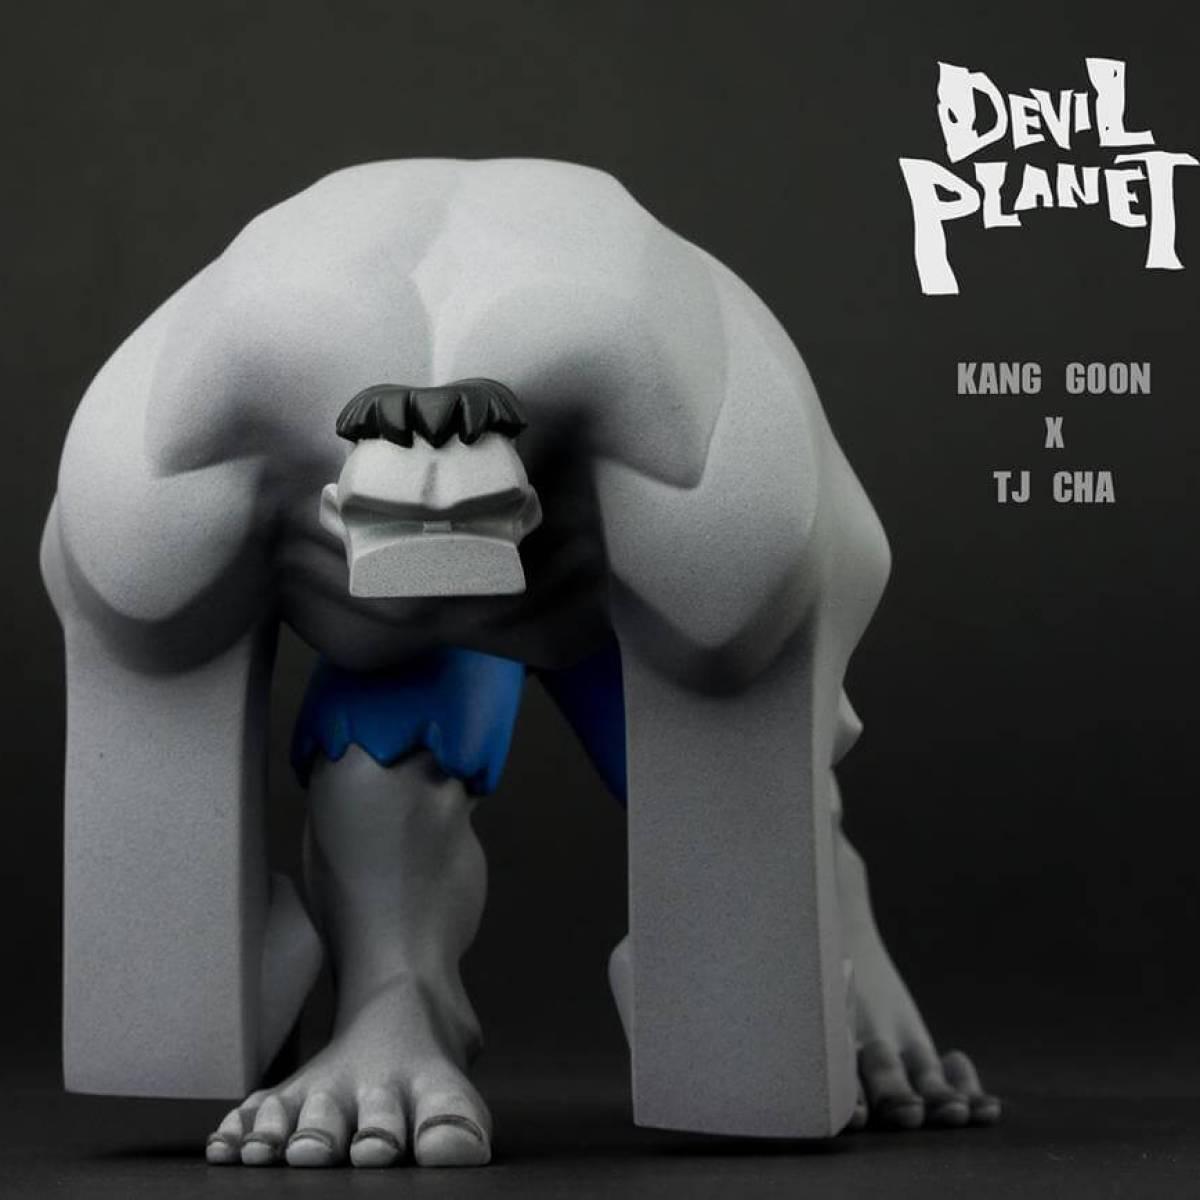 Mr Gray DEVIL PLANET HULK By Kang Goon x TJ Cha